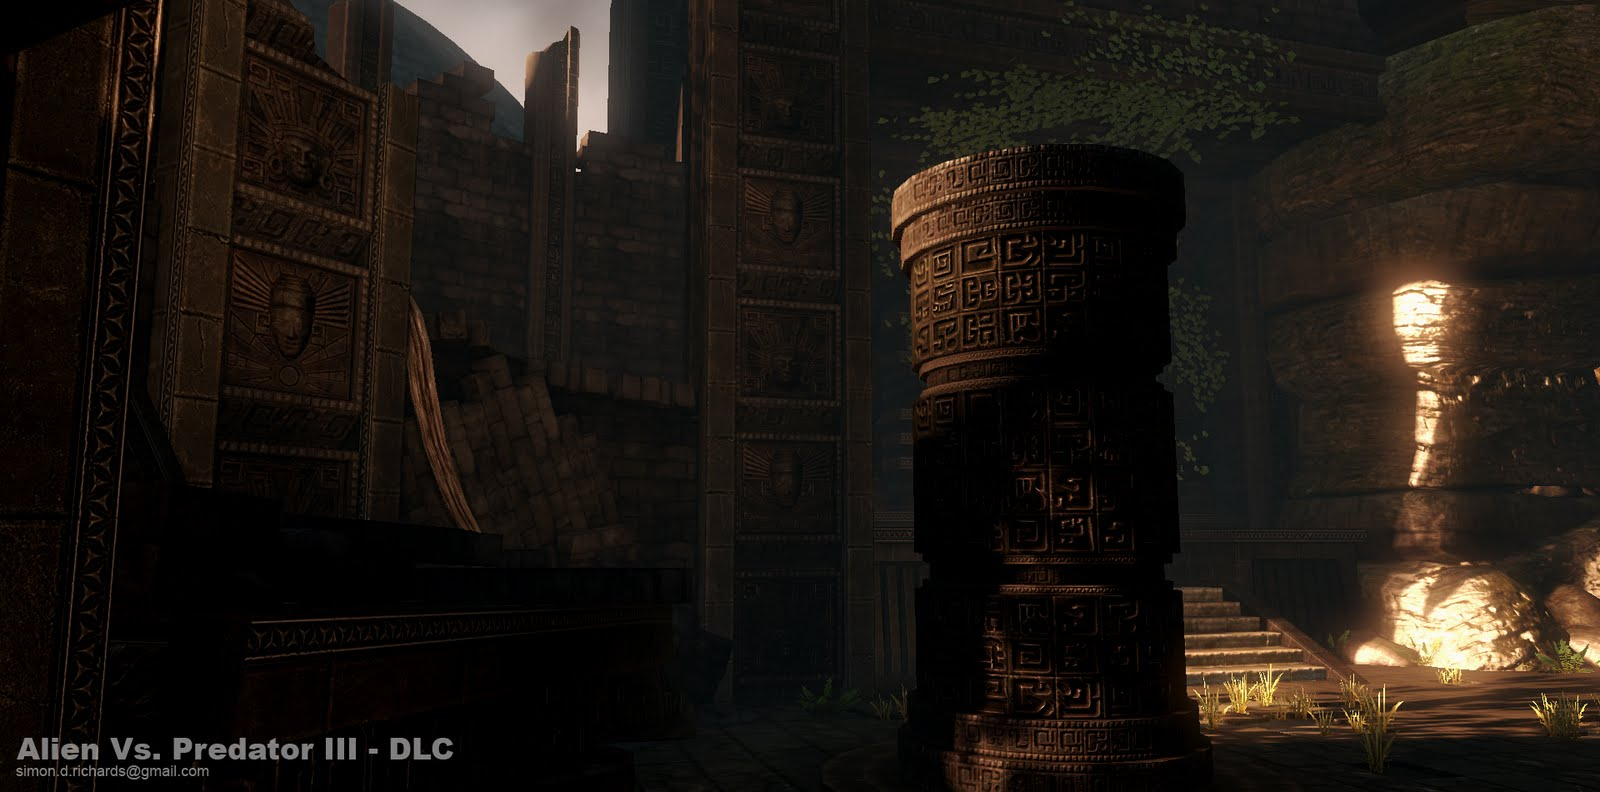 Alien_Vs_Predator_III_DLC_Cavern_05.jpg